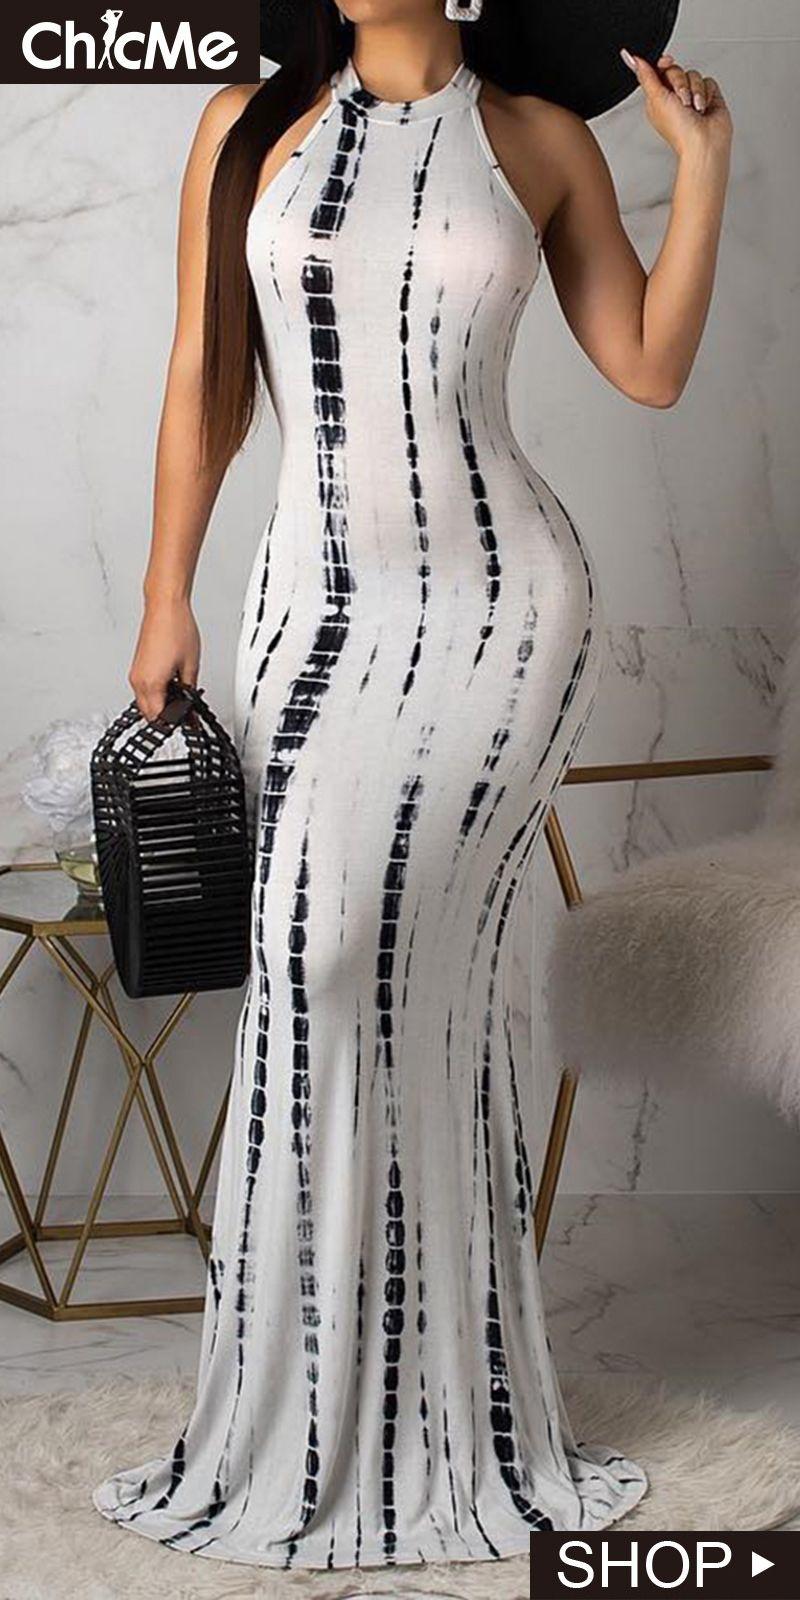 c0ba919e669e6 Tie Dye Print Cutout Back Maxi Dress | Chic Me Dress in 2019 ...